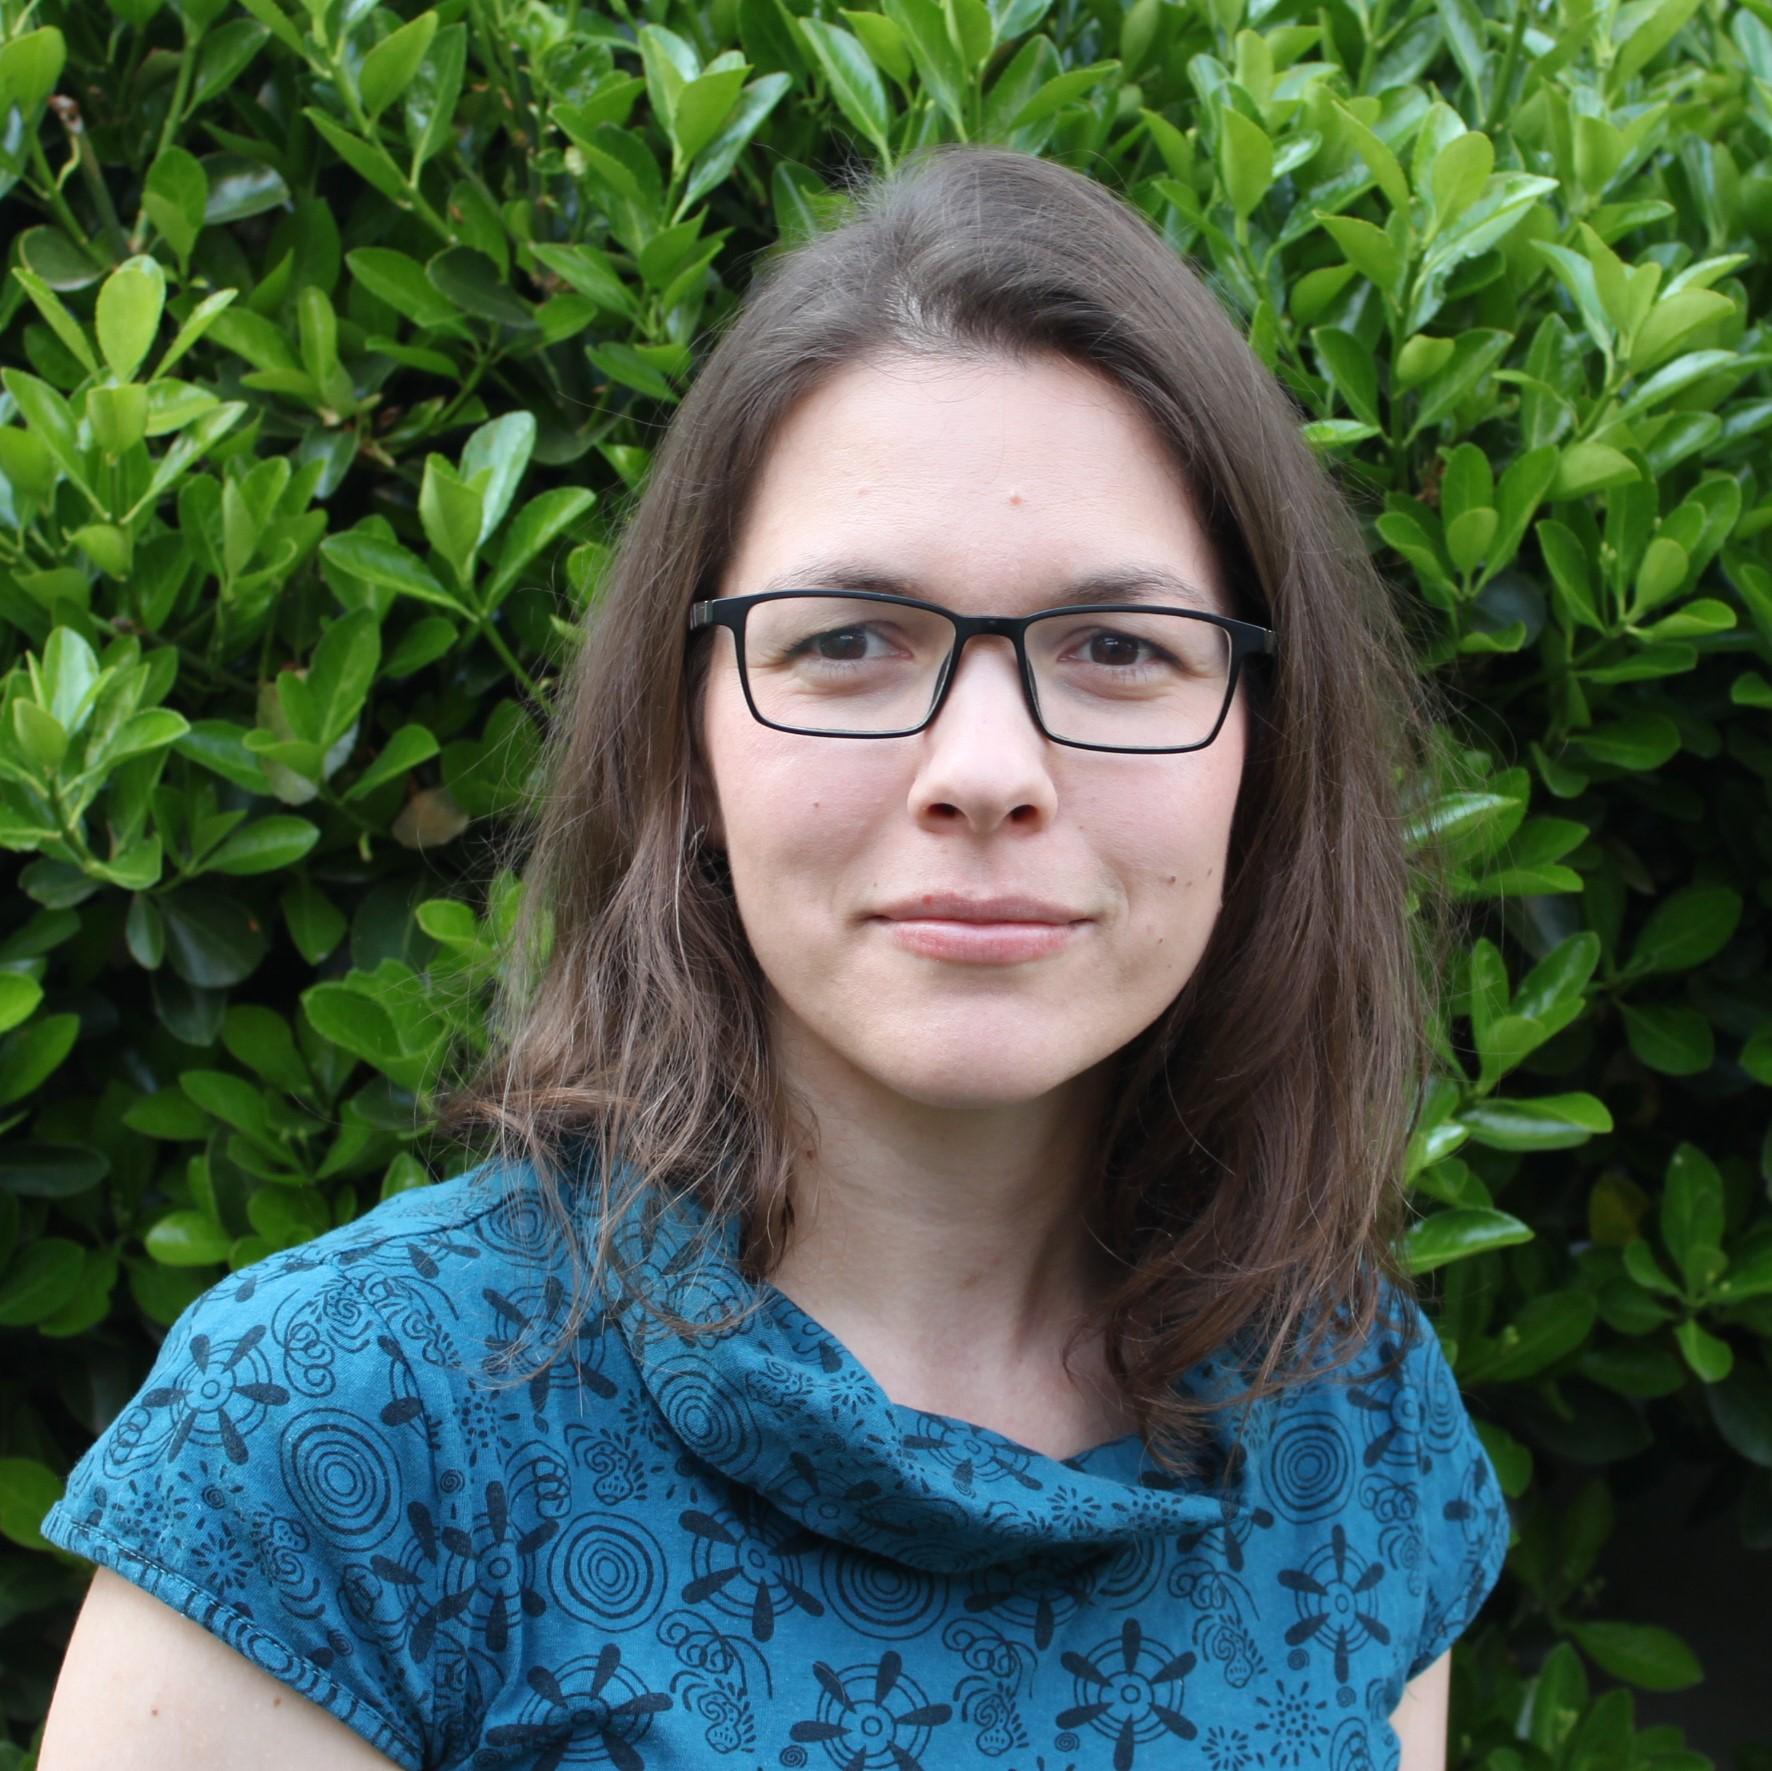 Miroslava Žilinská / Trainer, Consultant